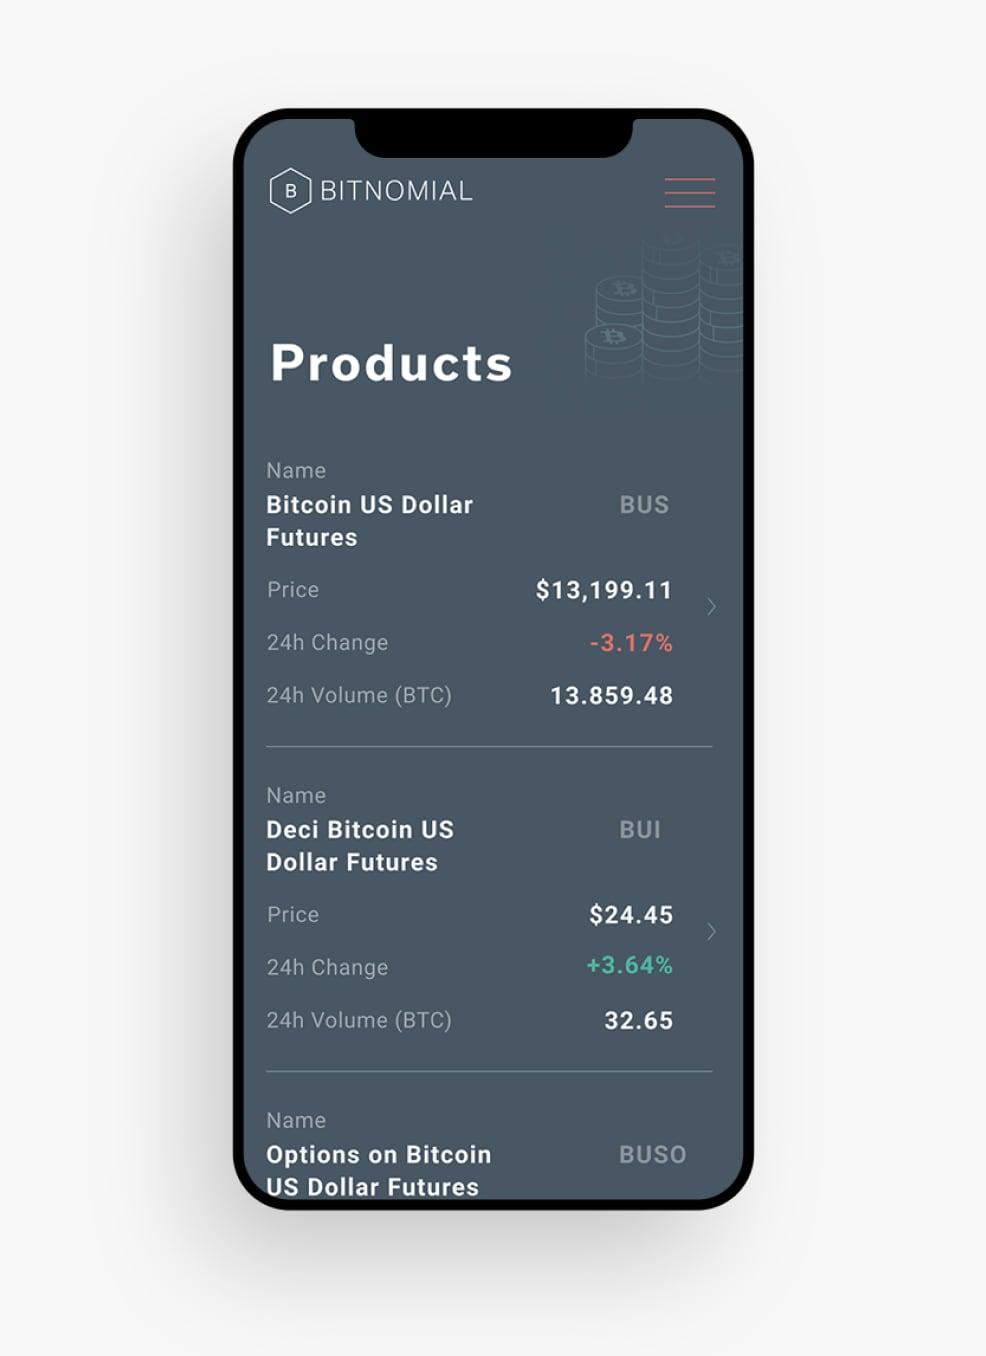 Bitcoin mobile. Products. Bitcoin US dollar futures. Deci bitcoin us dollar futures. Options on bitcoin US dollar futures.